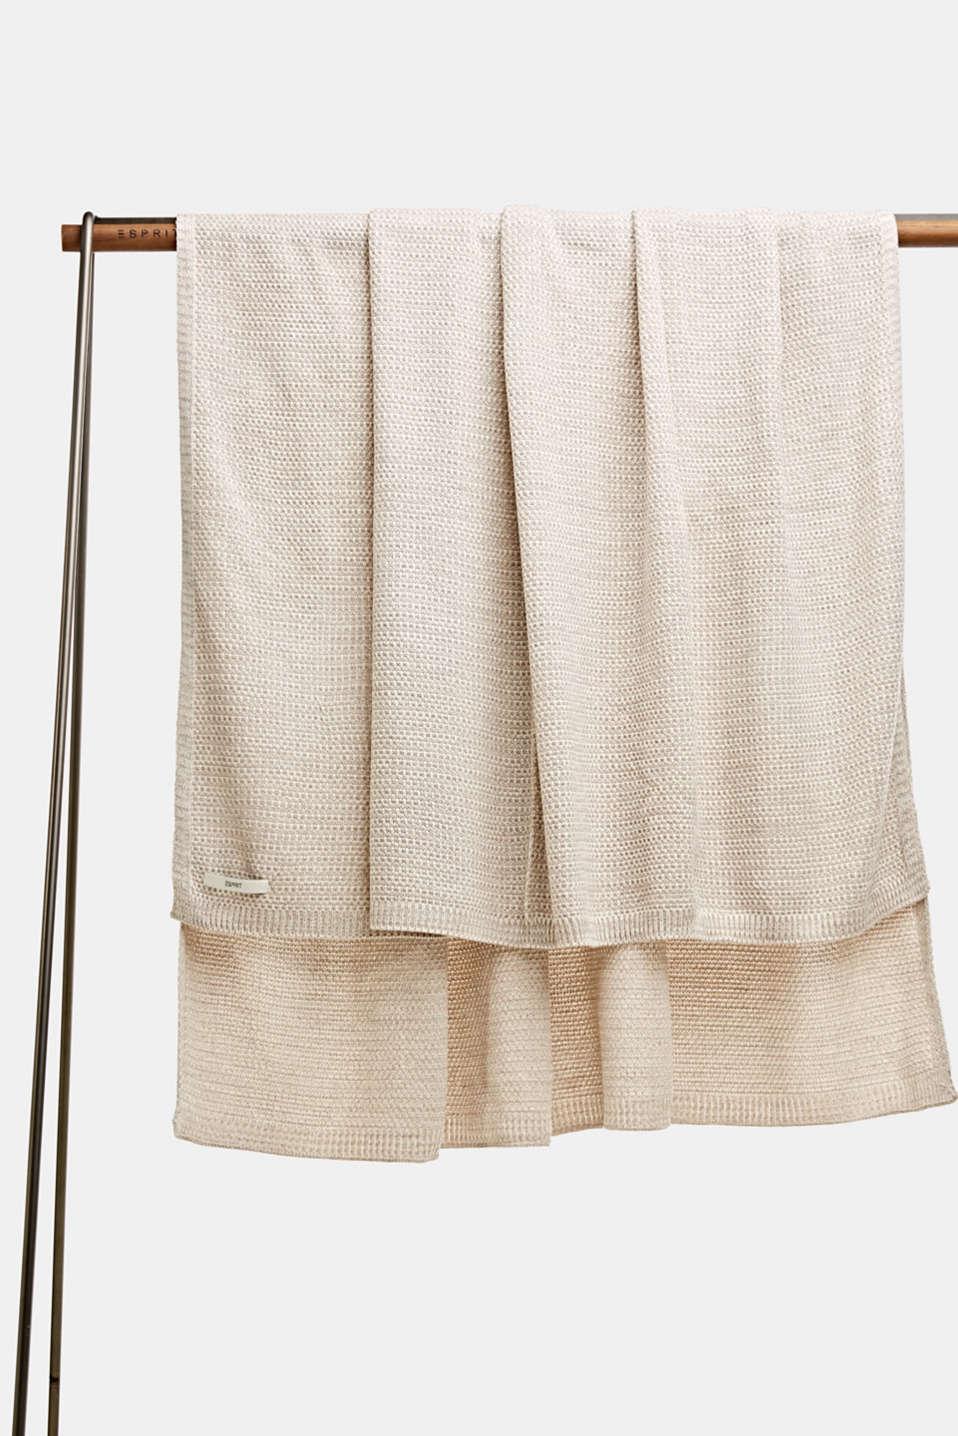 Knit plaid, LCNATURE, detail image number 0